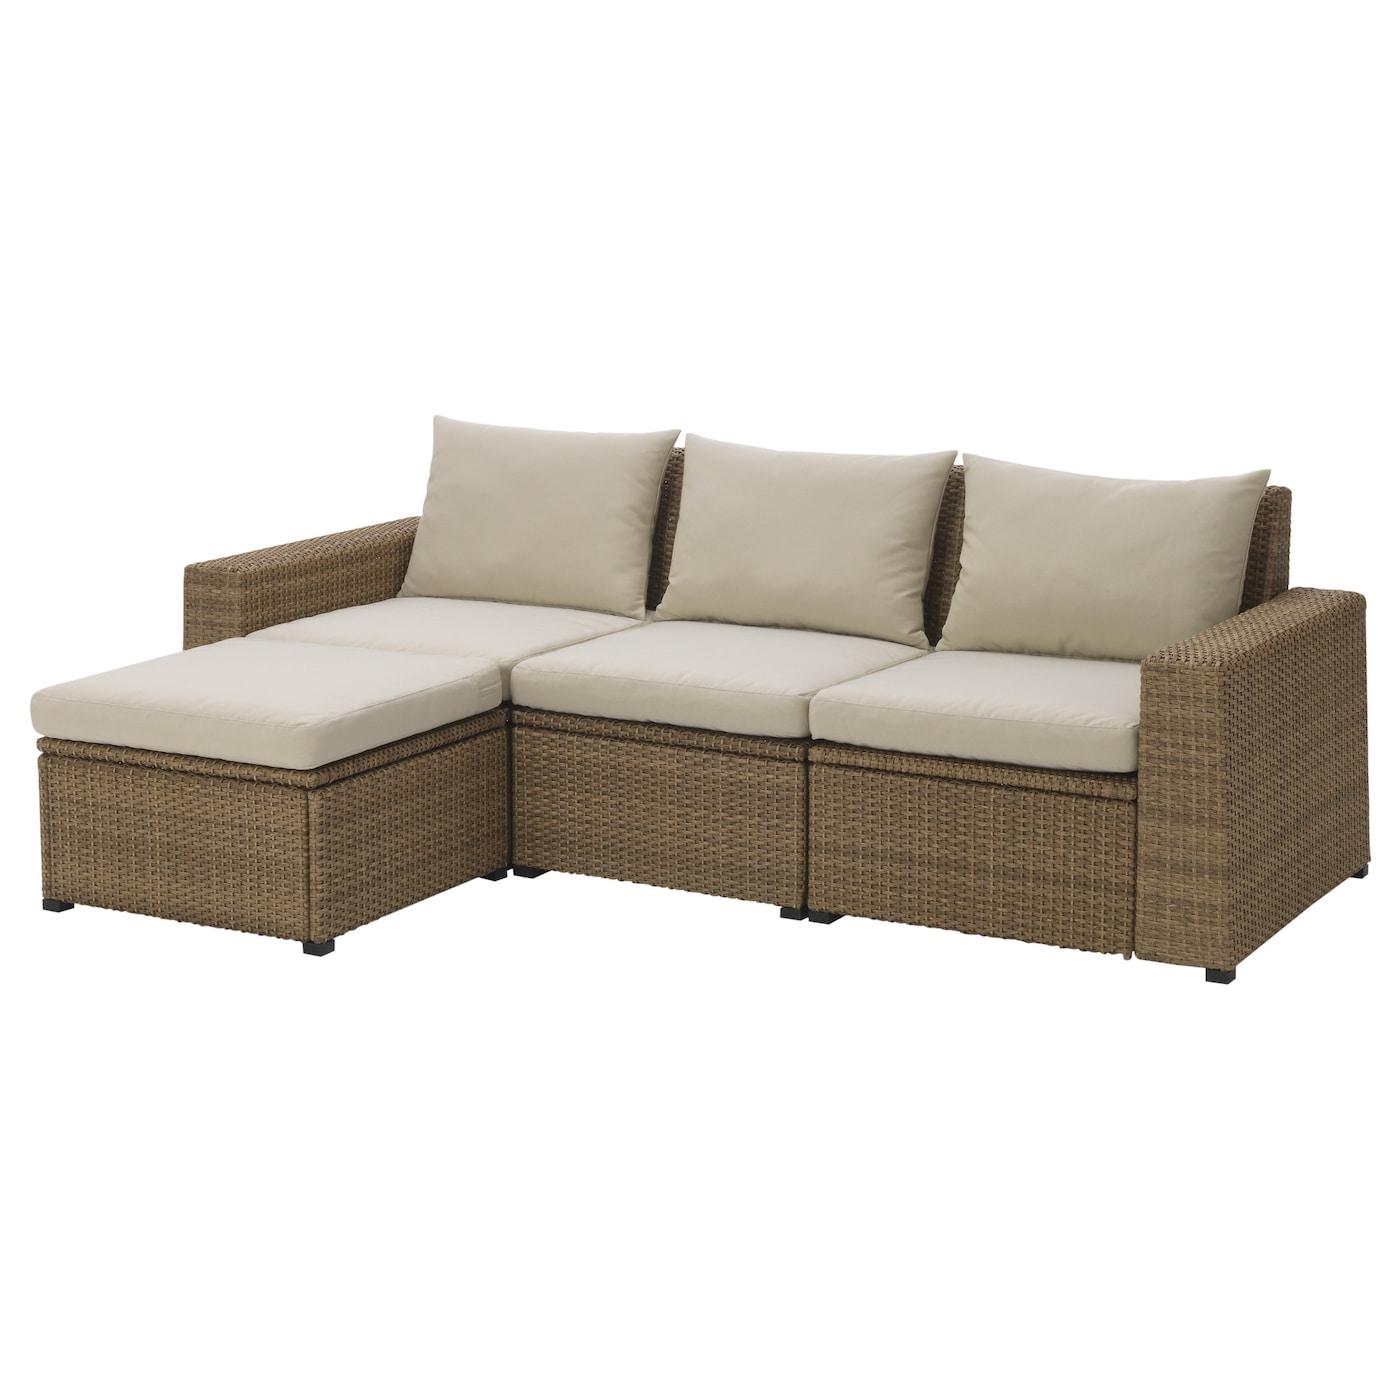 rattan garden furniture plastic rattan furniture ikea. Black Bedroom Furniture Sets. Home Design Ideas